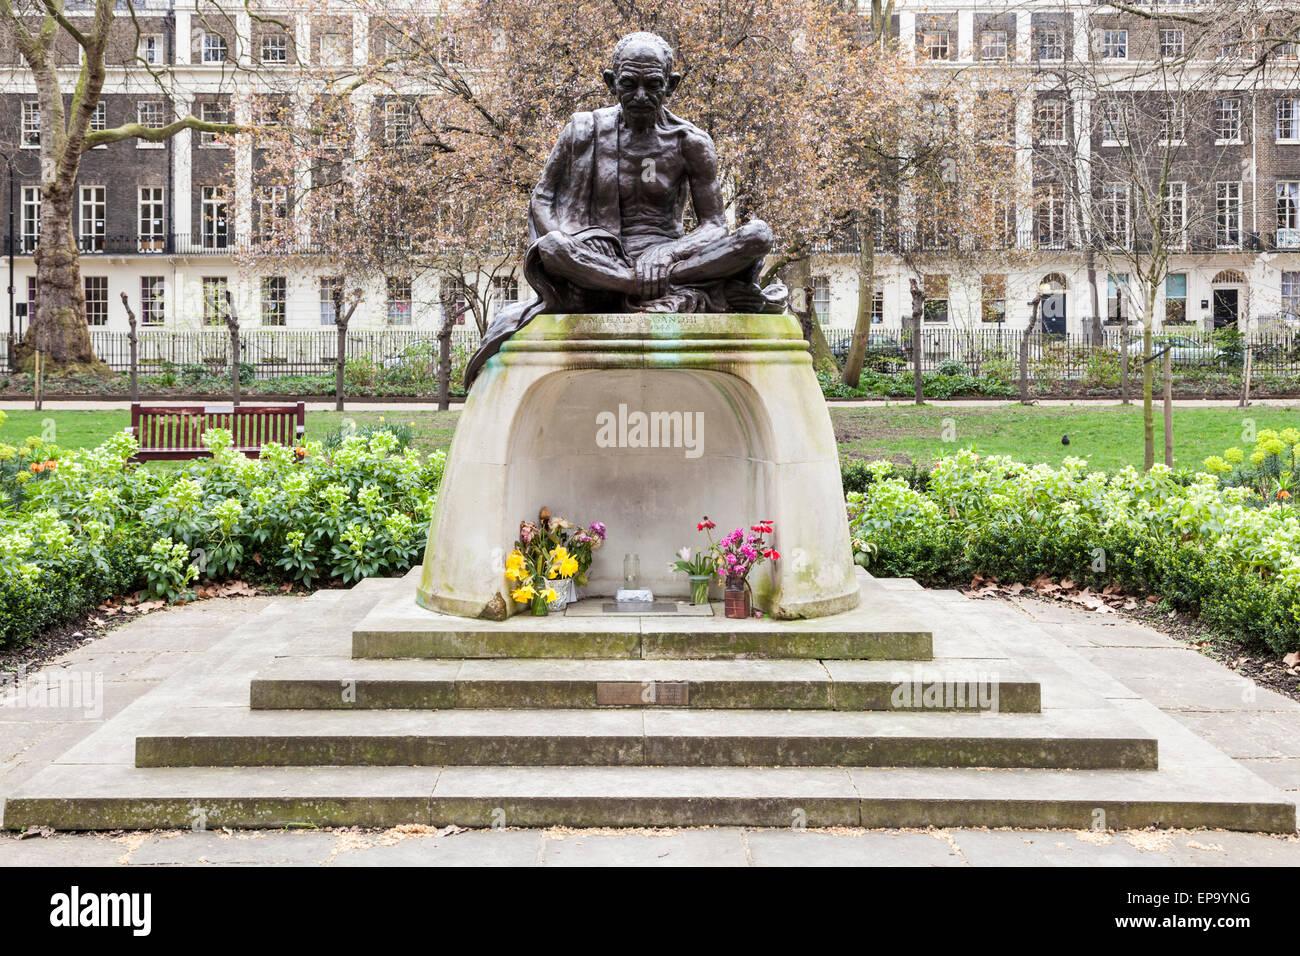 Mahatma Gandhi statue, Tavistock Gardens, Tavistock Square, London, England, UK - Stock Image